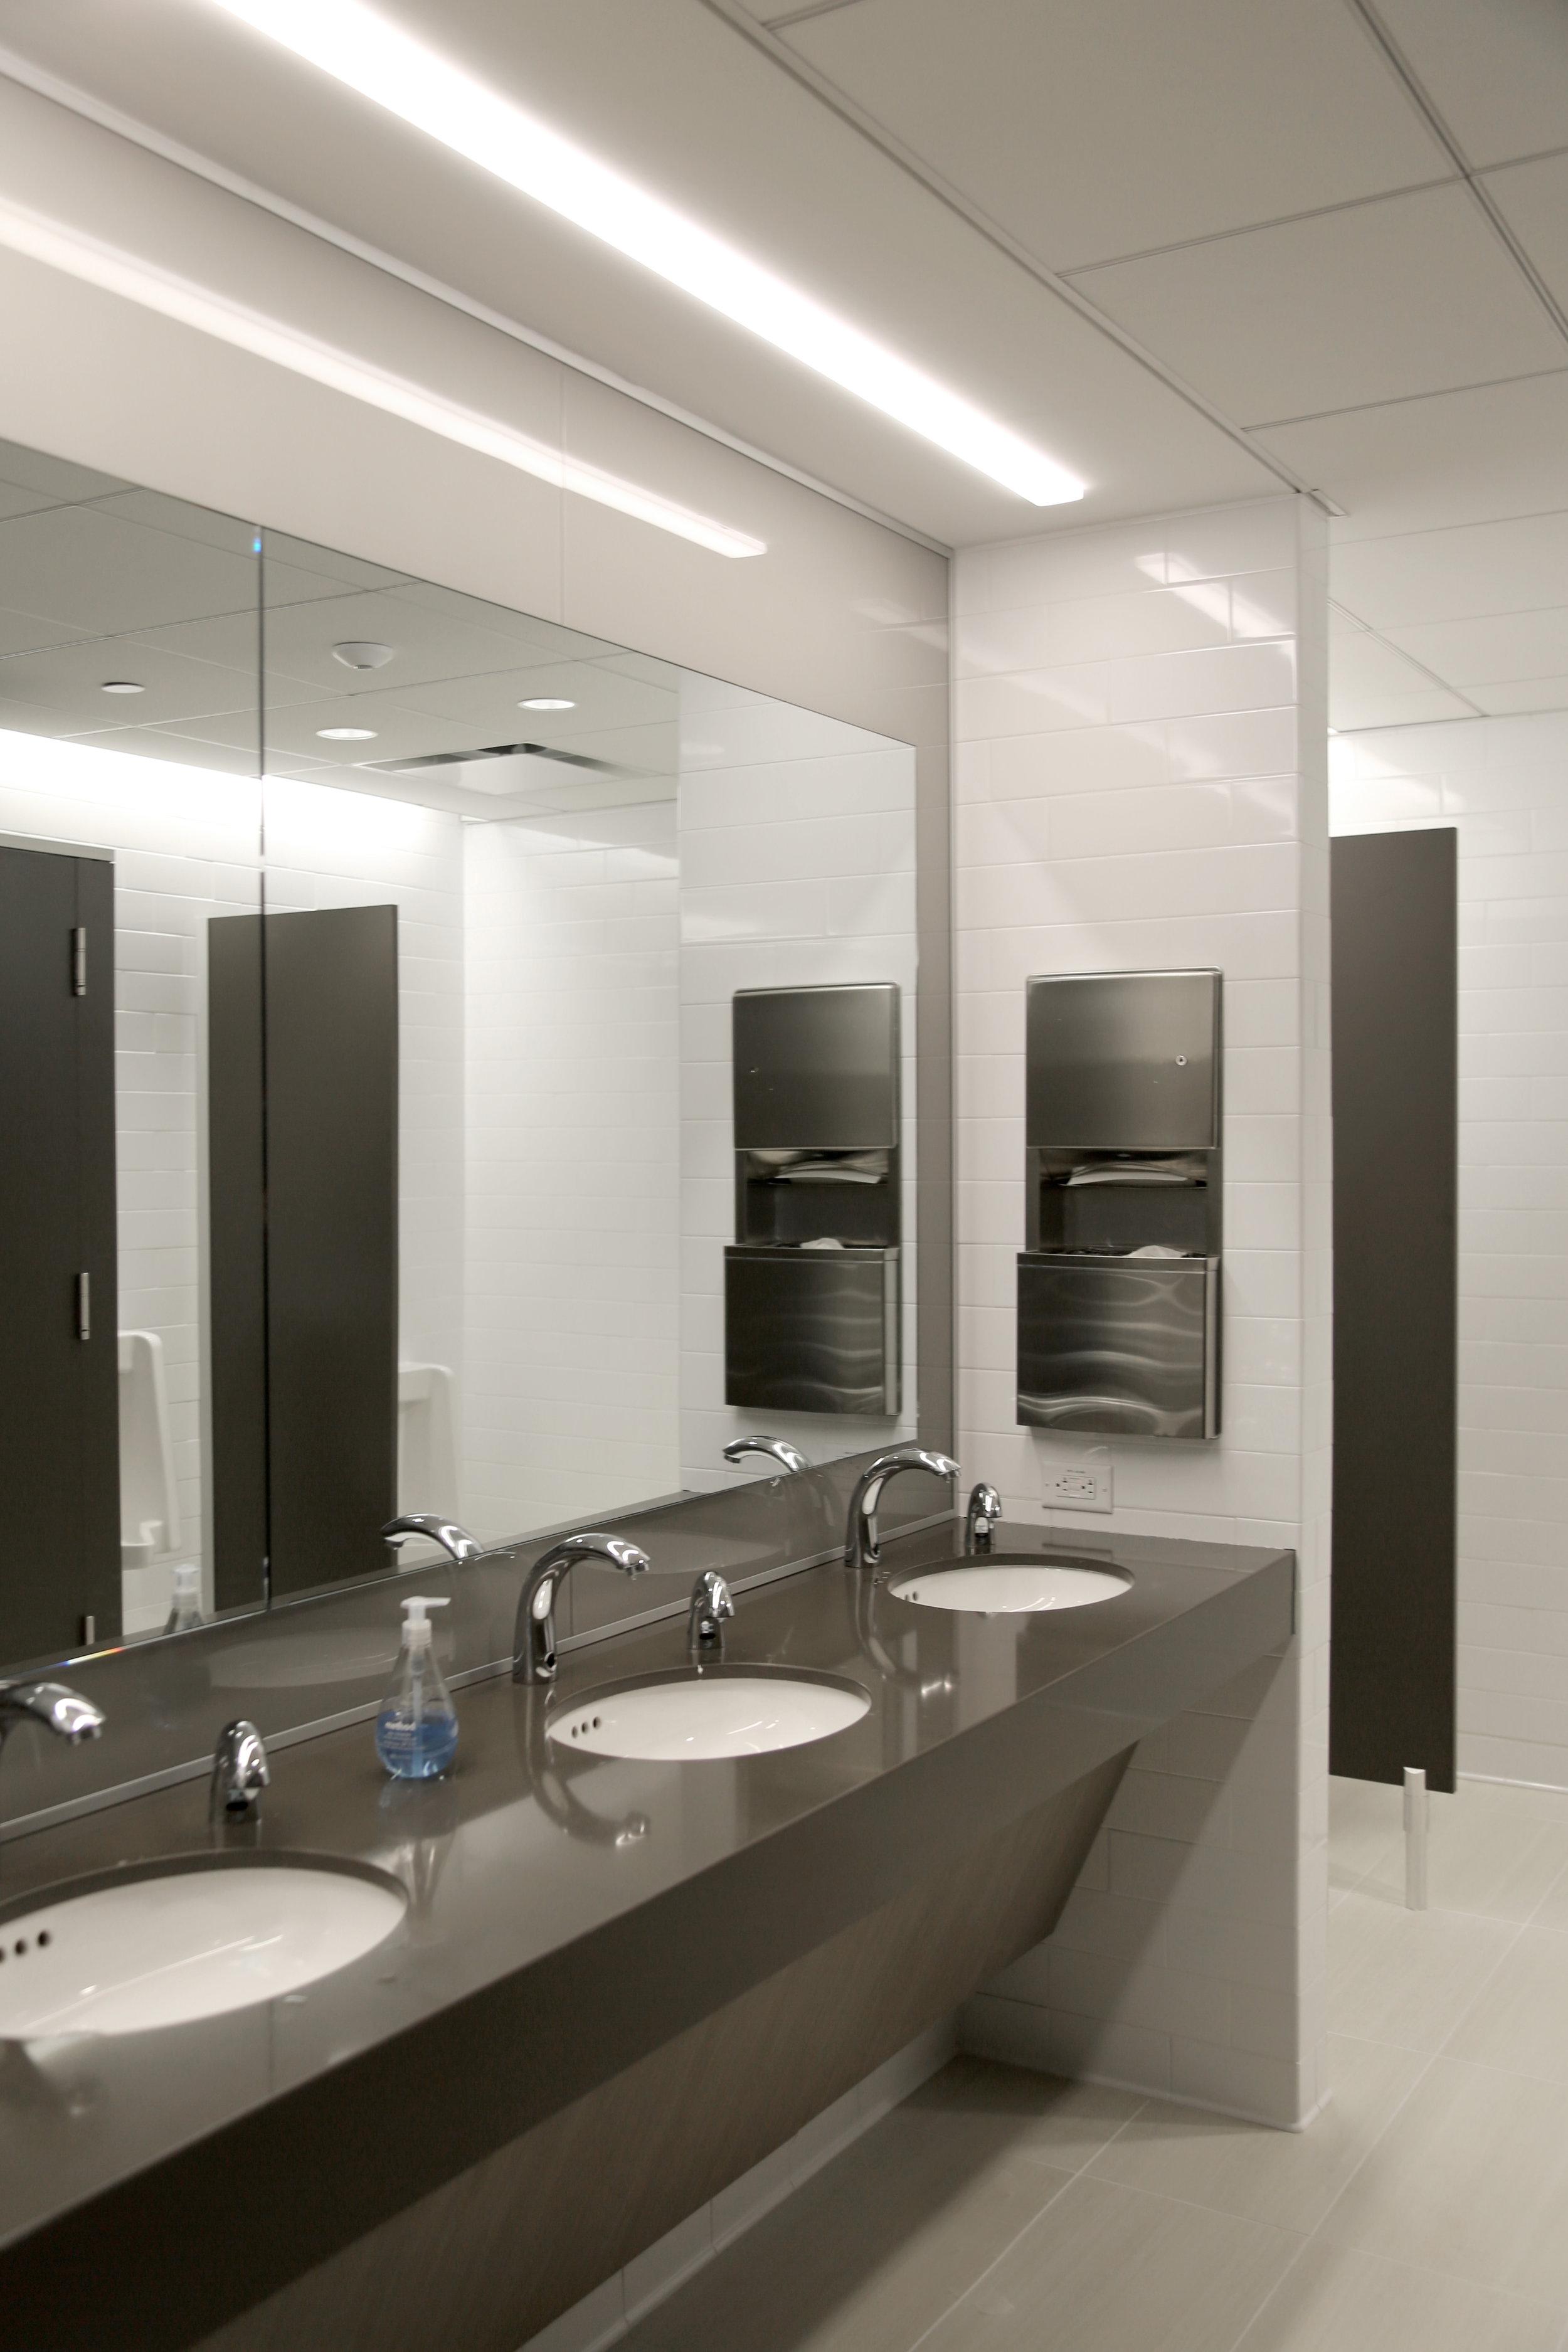 Custom Bathroom Mirror Light Back-Painted Glass - Spaceworks AI.jpg